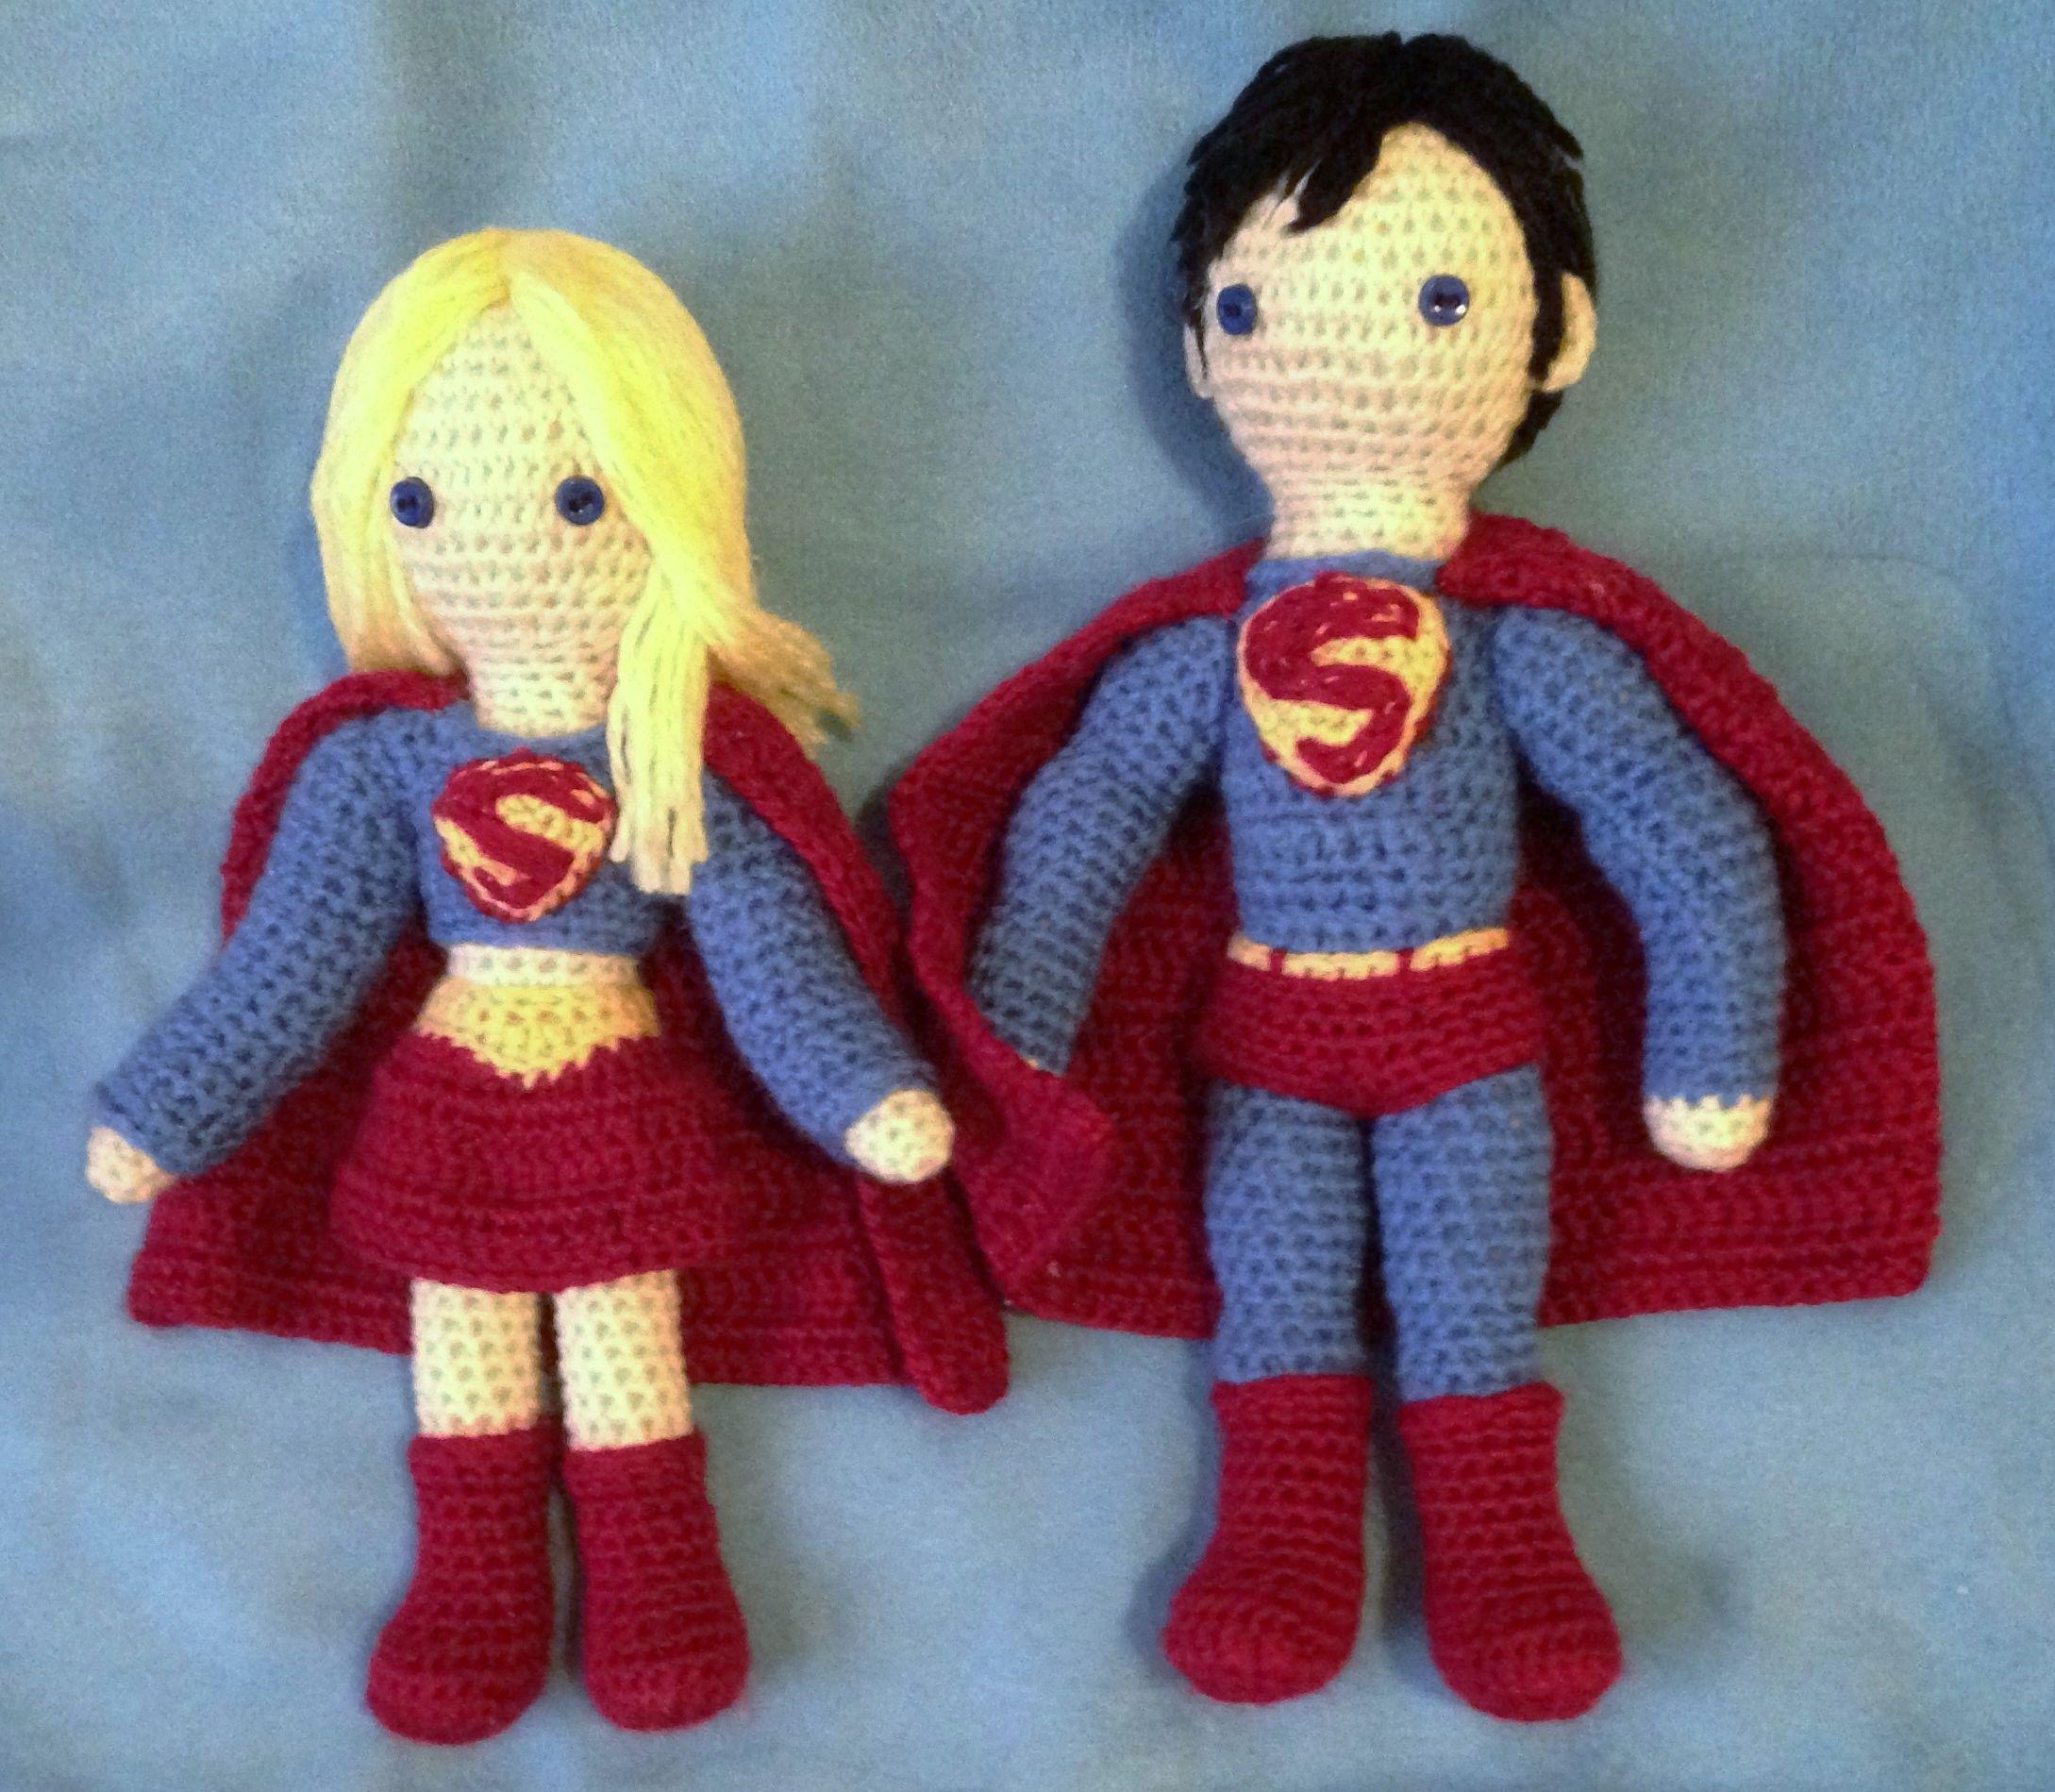 Knitting Pattern Superman Doll : Amigurumi Superman and Supergirl Knit & Crochet Pinterest